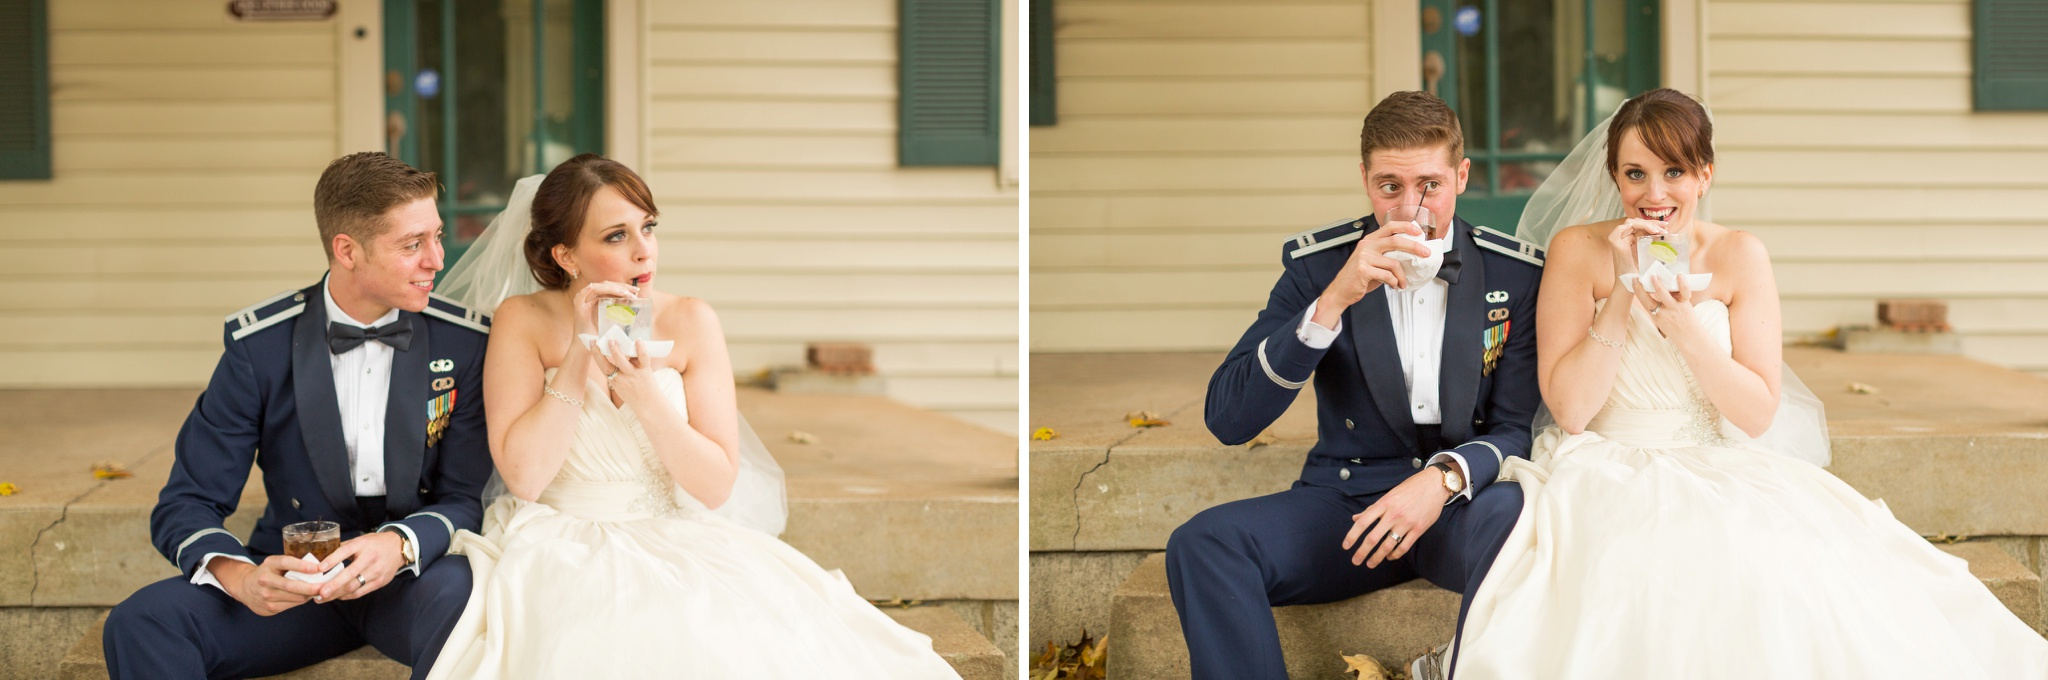 bride-and-groom-drinks-wedding